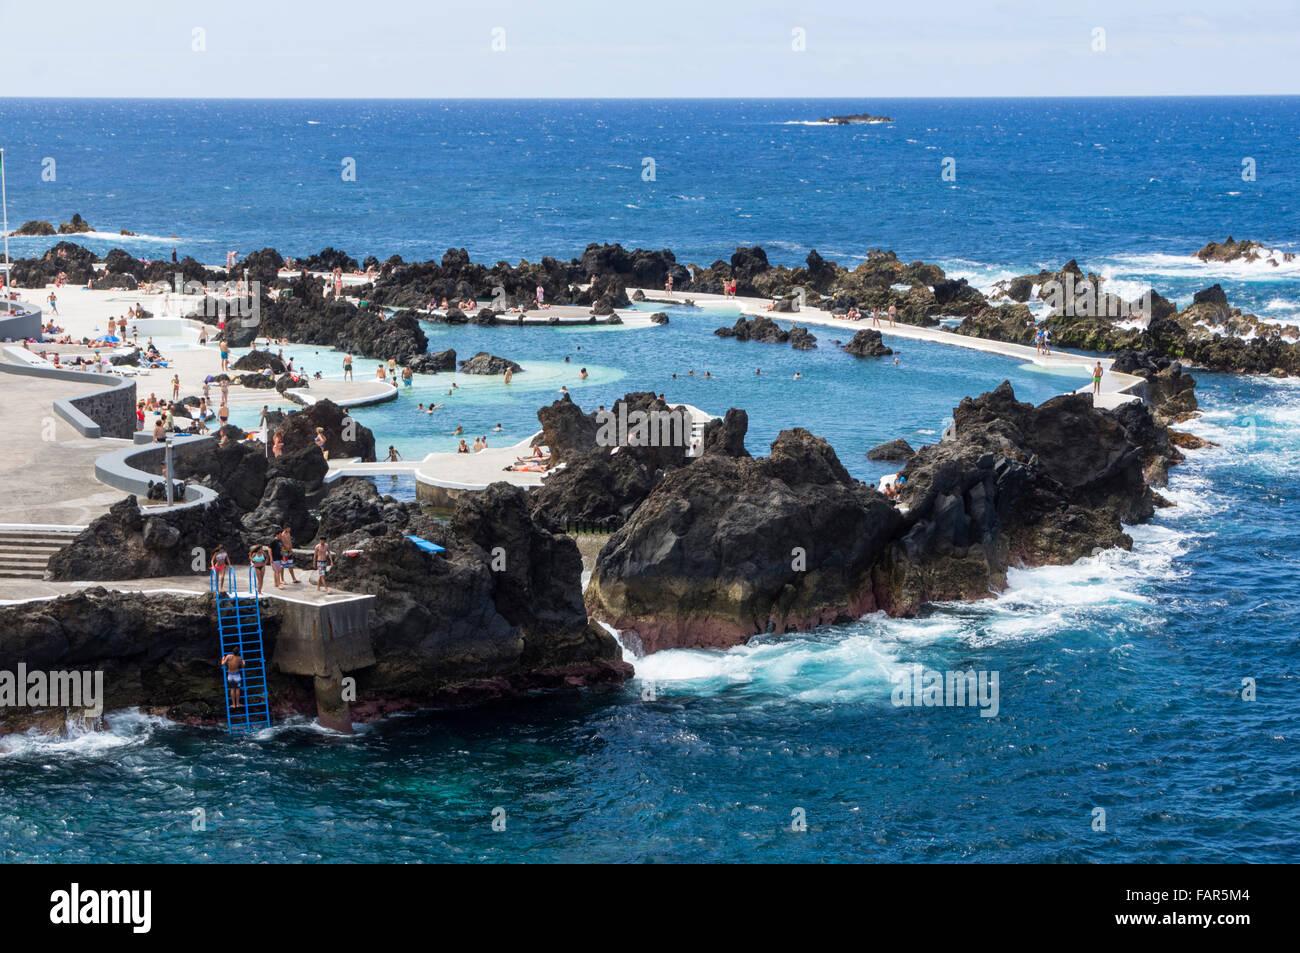 Madeira Porto Moniz Natural Lava Sea Swimming Pools In The Rocks Stock Photo 92707780 Alamy